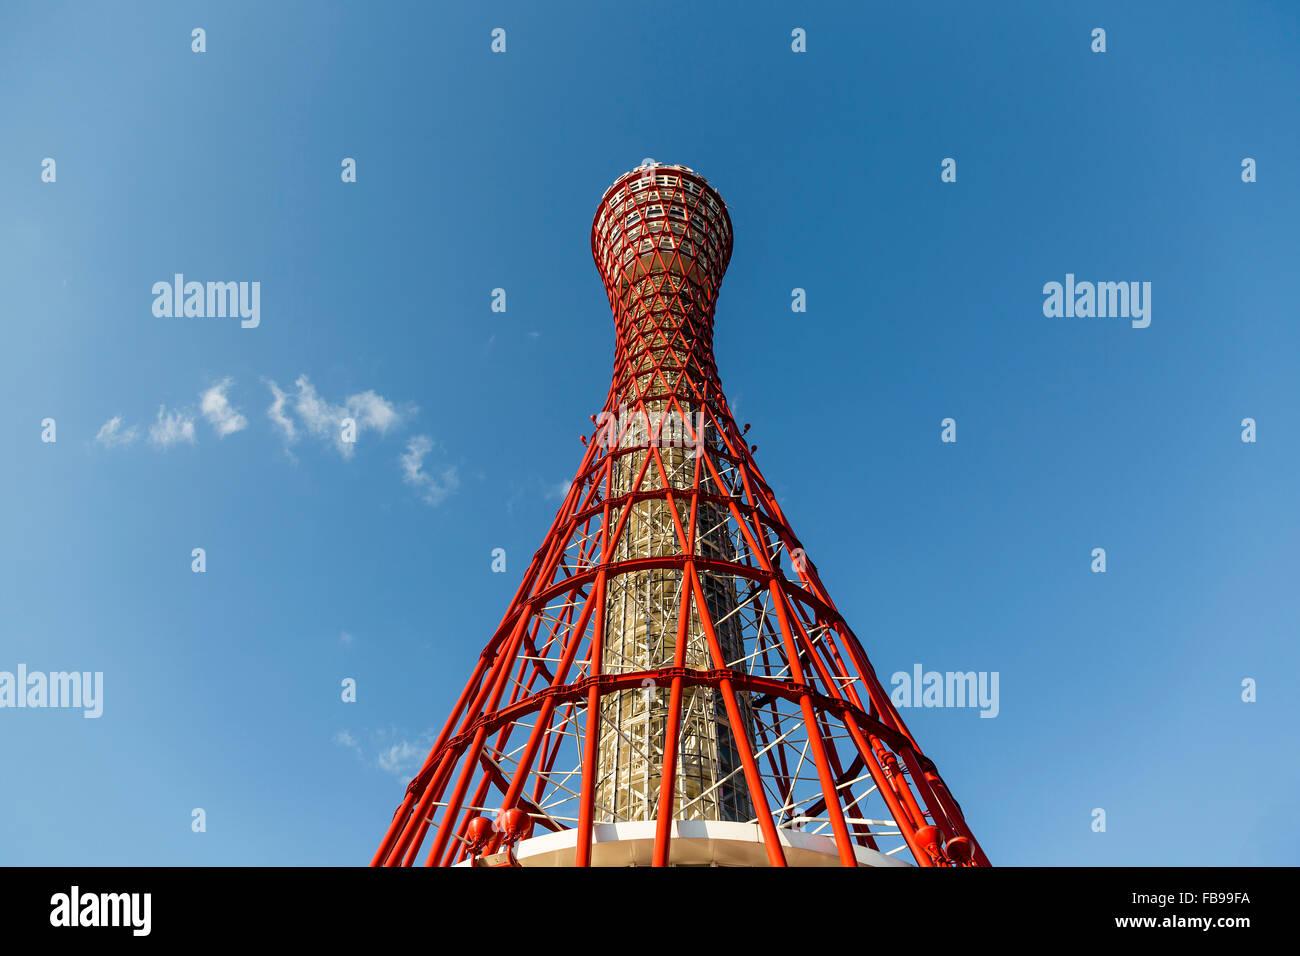 The iconic Kobe Tower, Japan - Stock Image